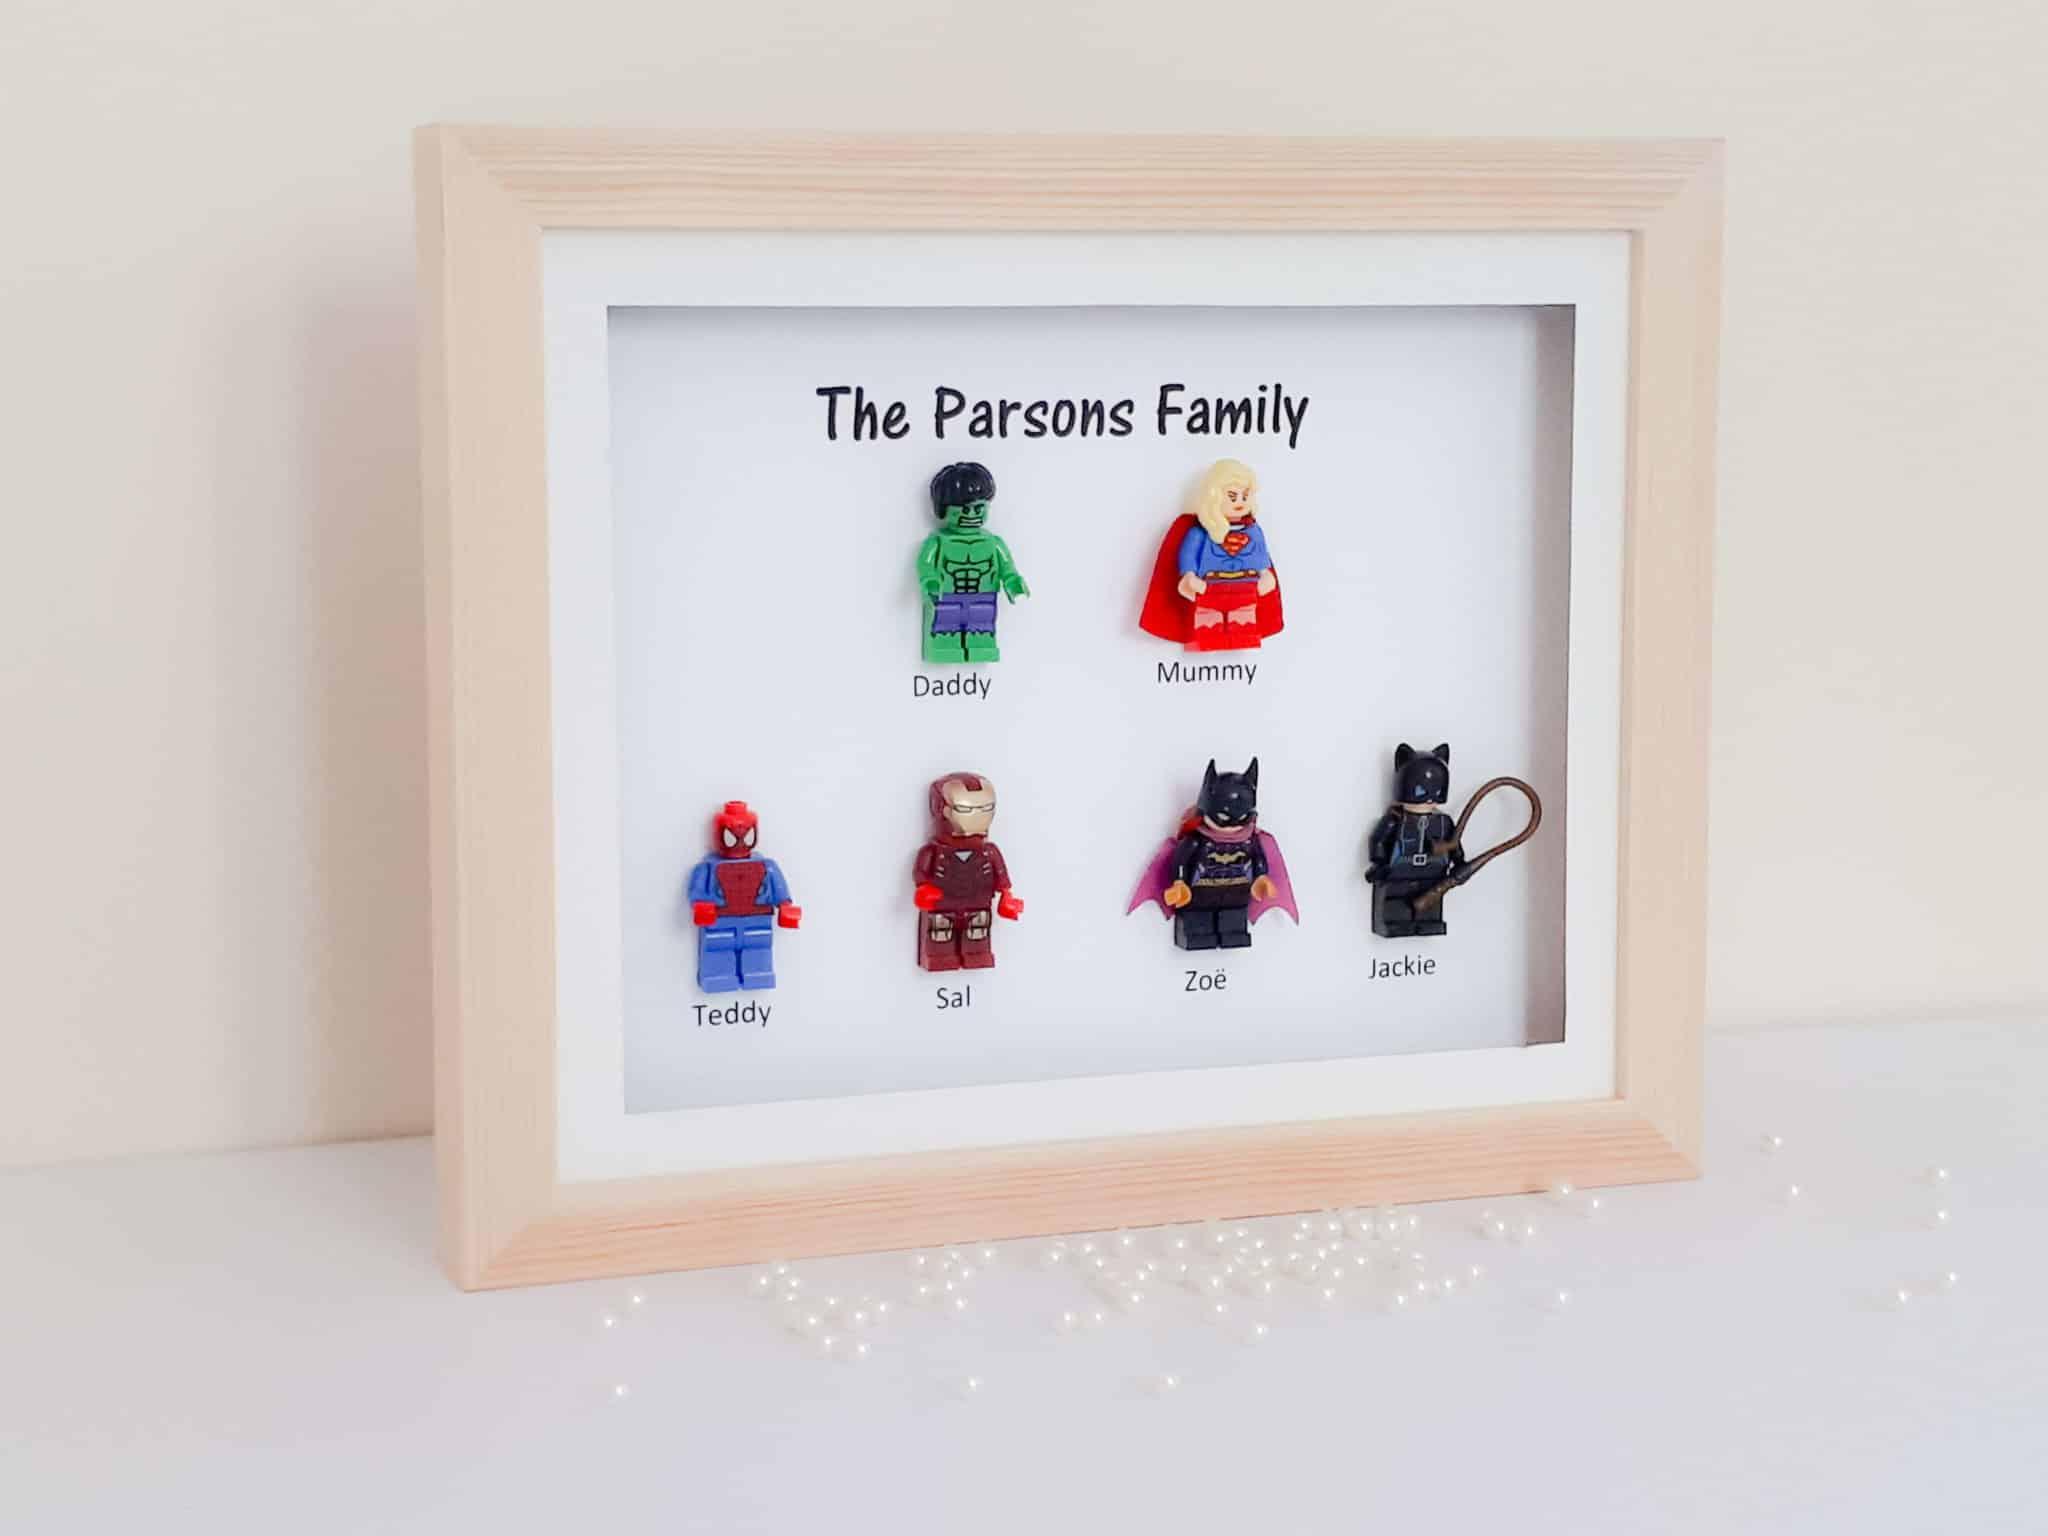 Lego superhero family frame | FREE UK delivery | Little gems online